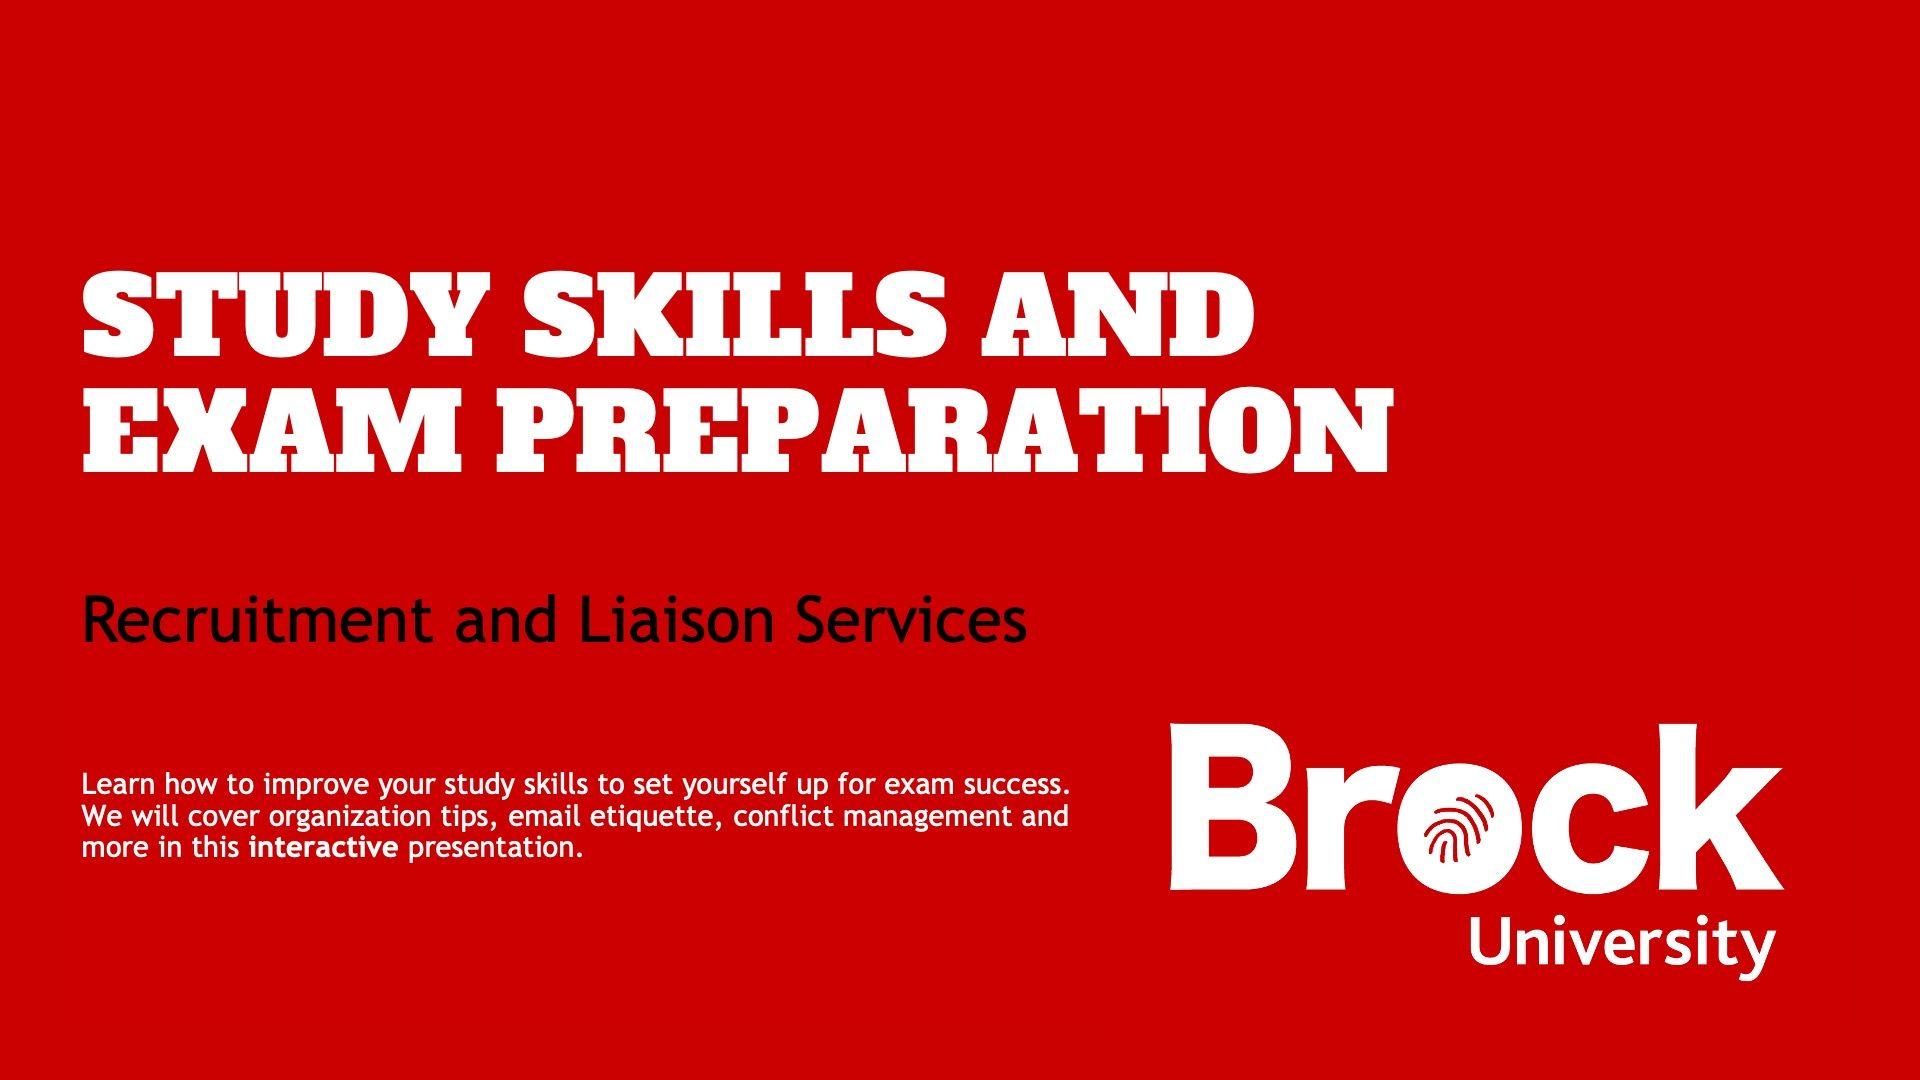 Study skills and exam preparation